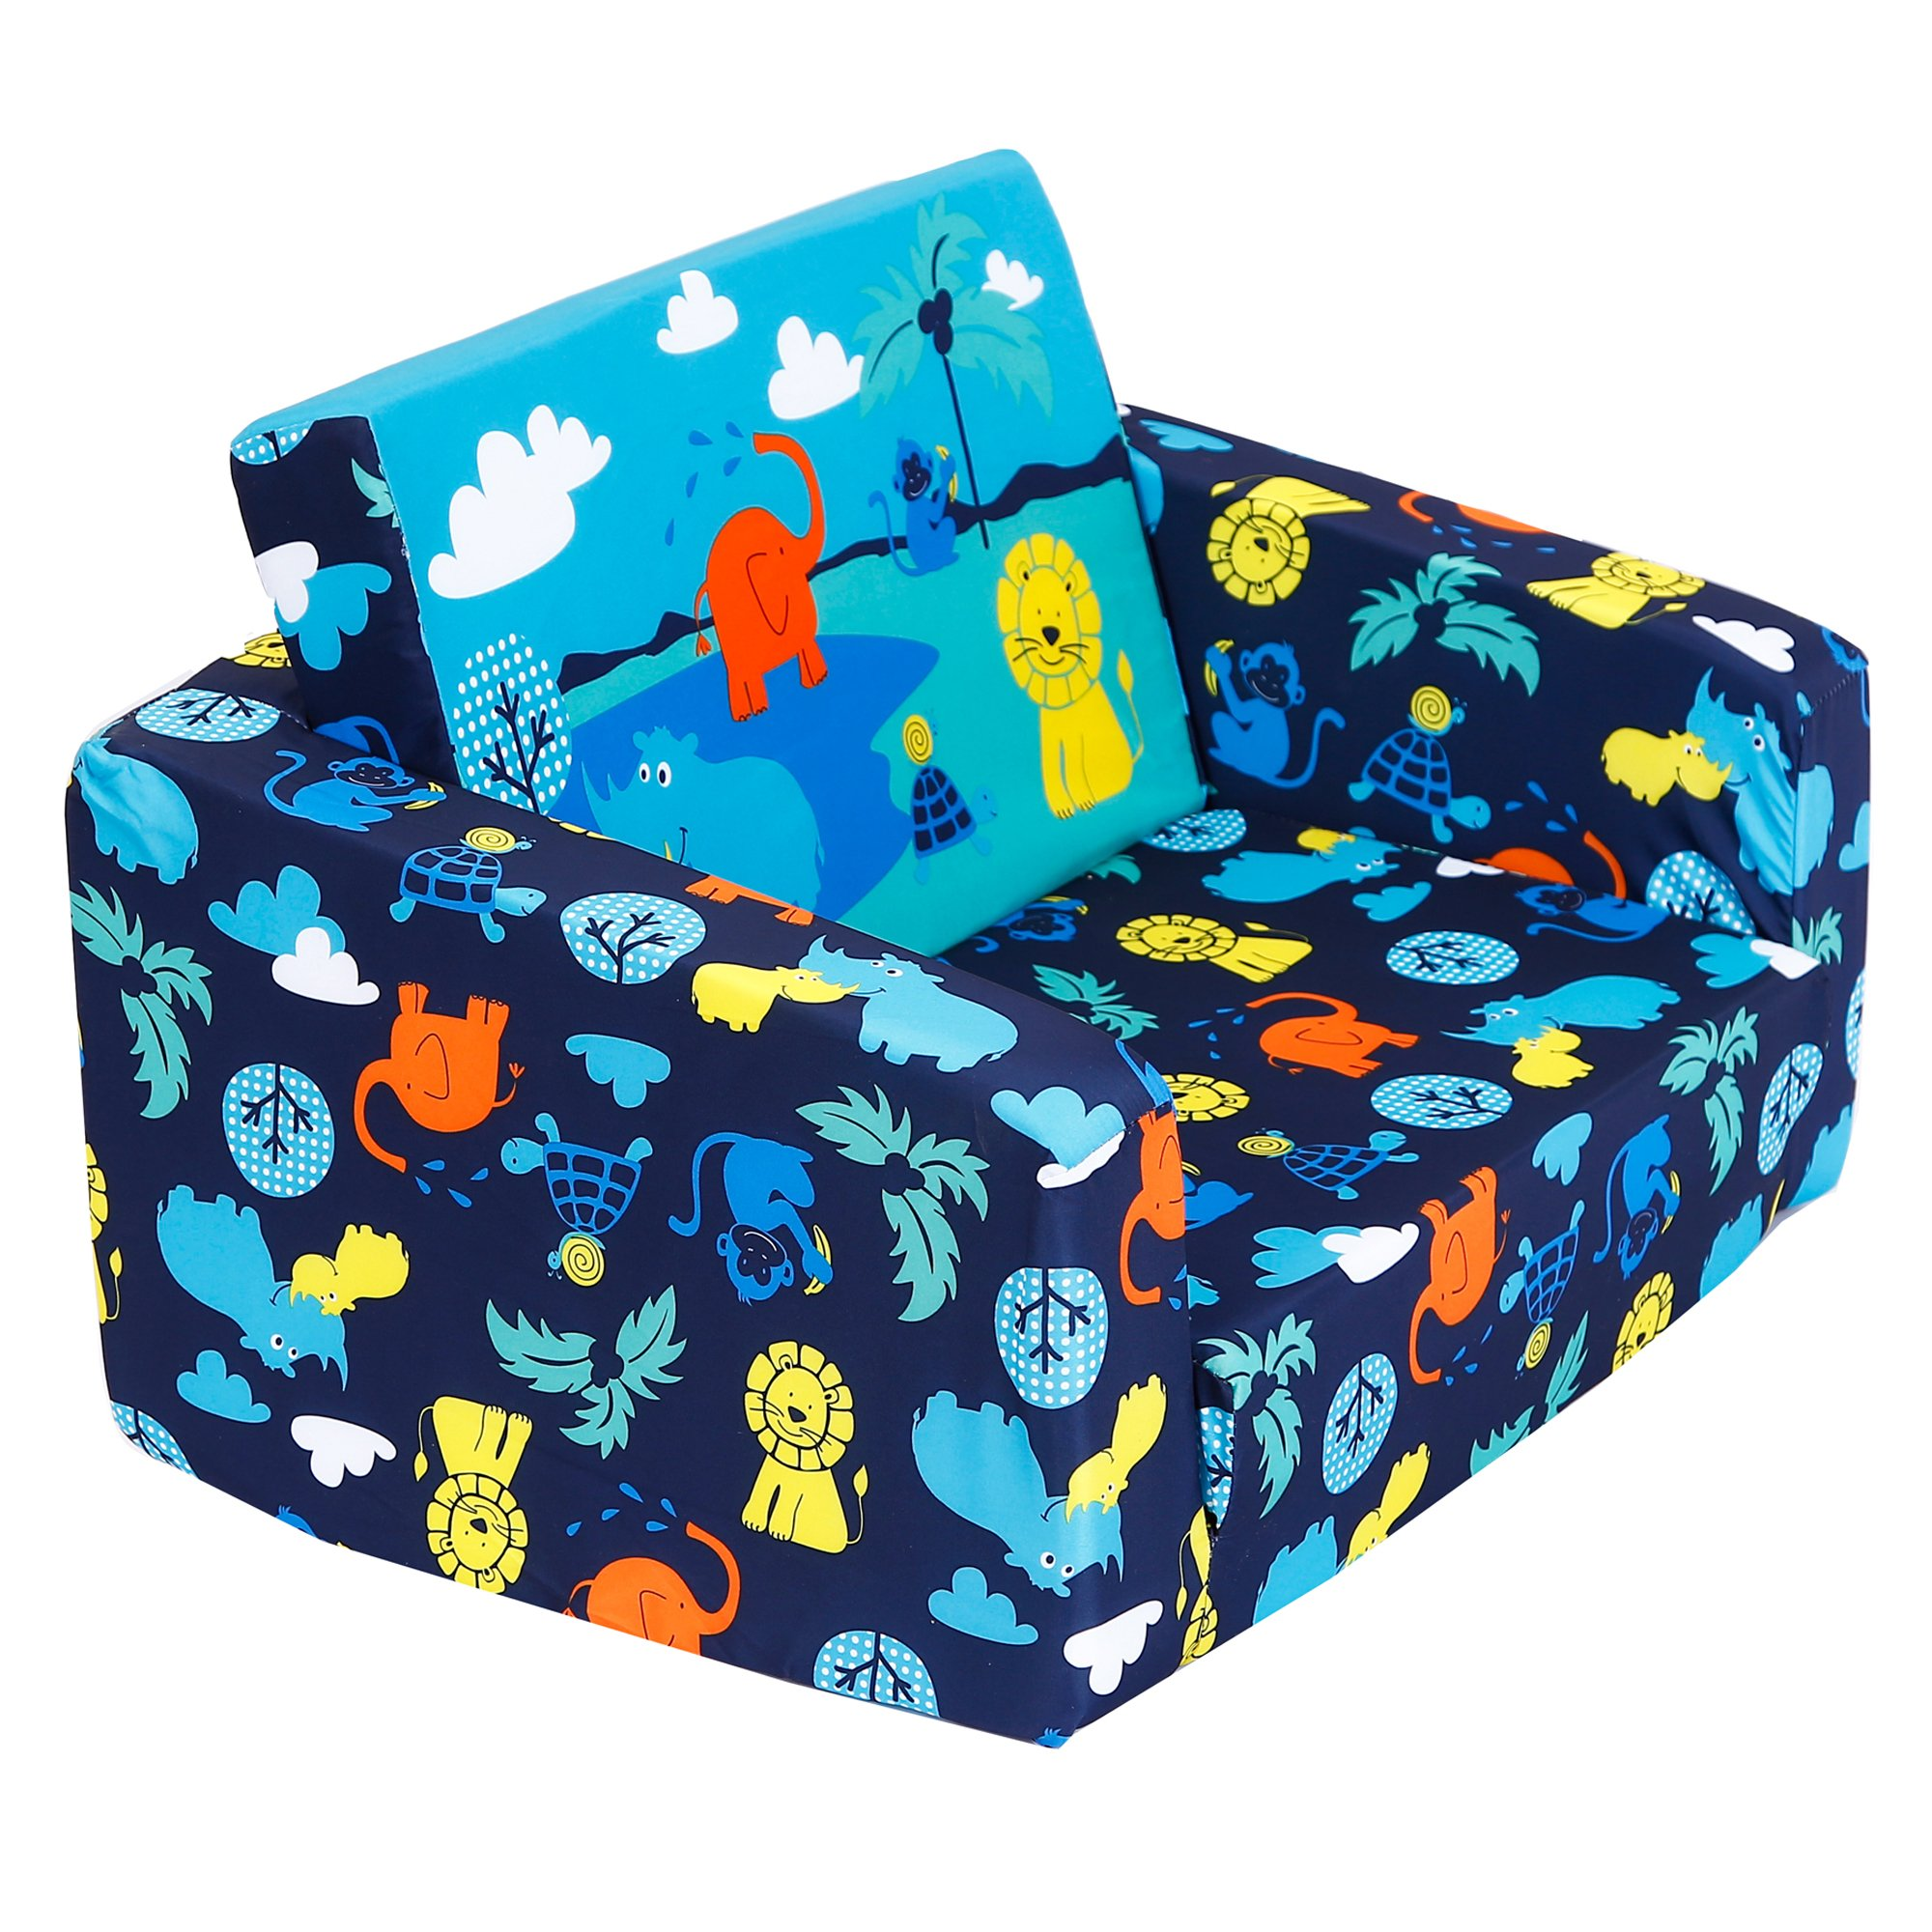 Baby Sofa Bed: MallBest Kids Sofas Children's Sofa Bed Baby's Upholstered